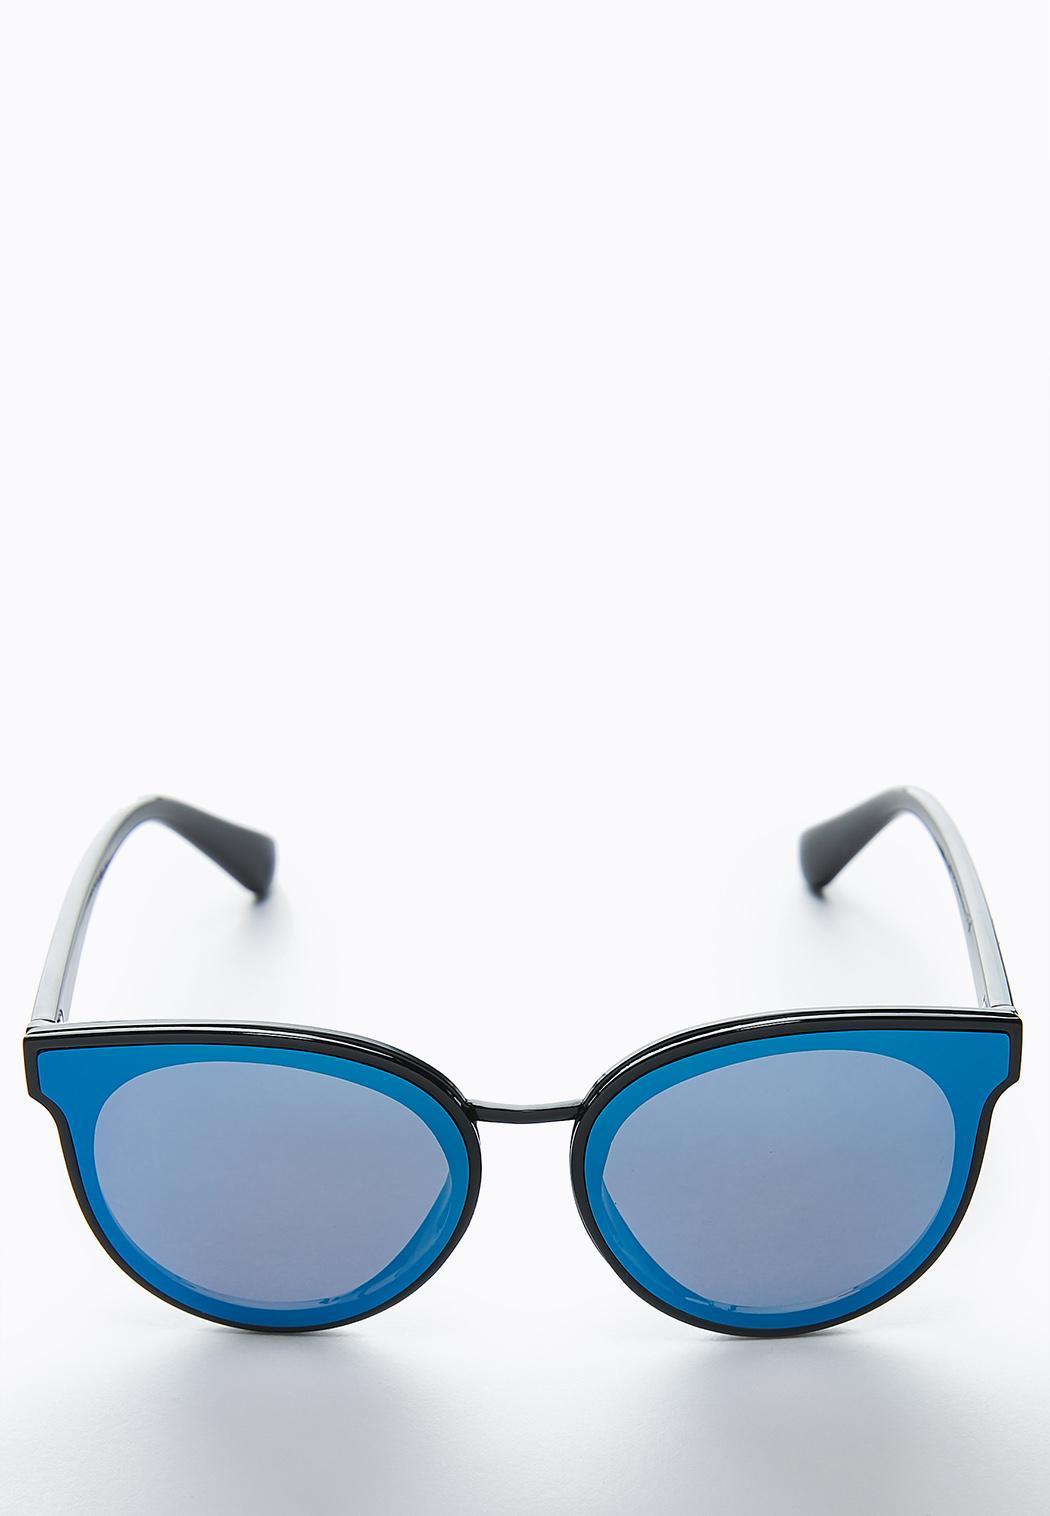 Blue Lens Mirrored Sunglasses